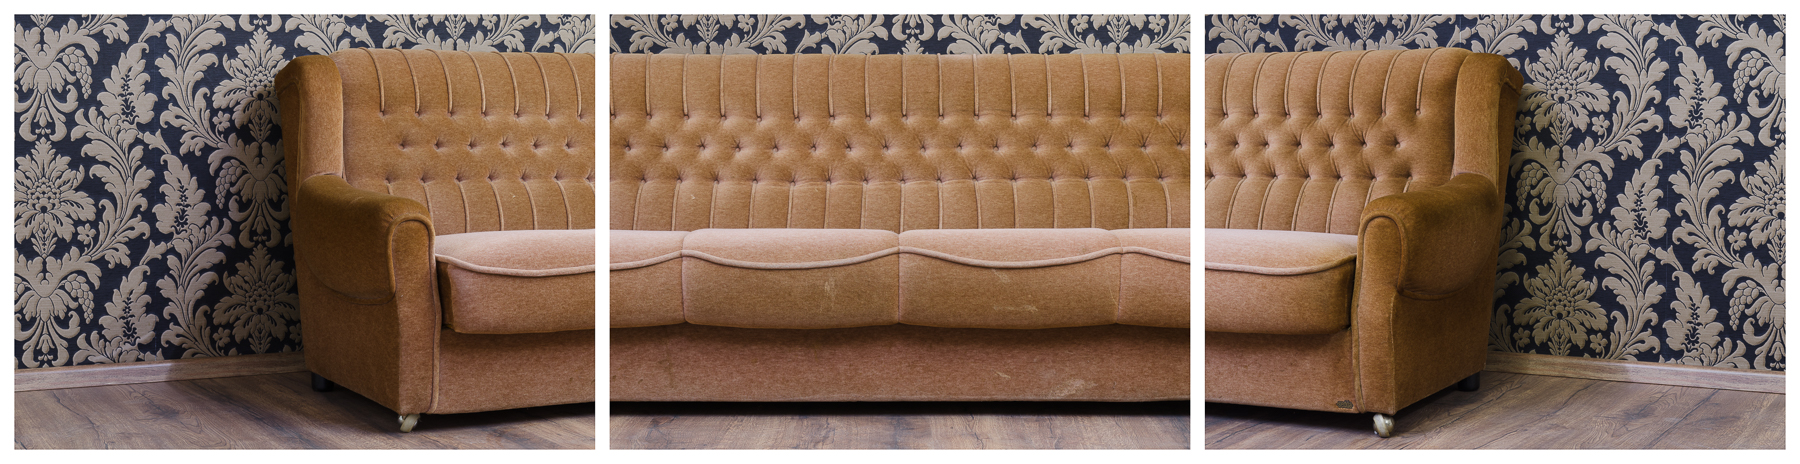 Sofa, 2016 Inkjet-Pigmentdruck 3-teilig zu je 120 × 90 cm